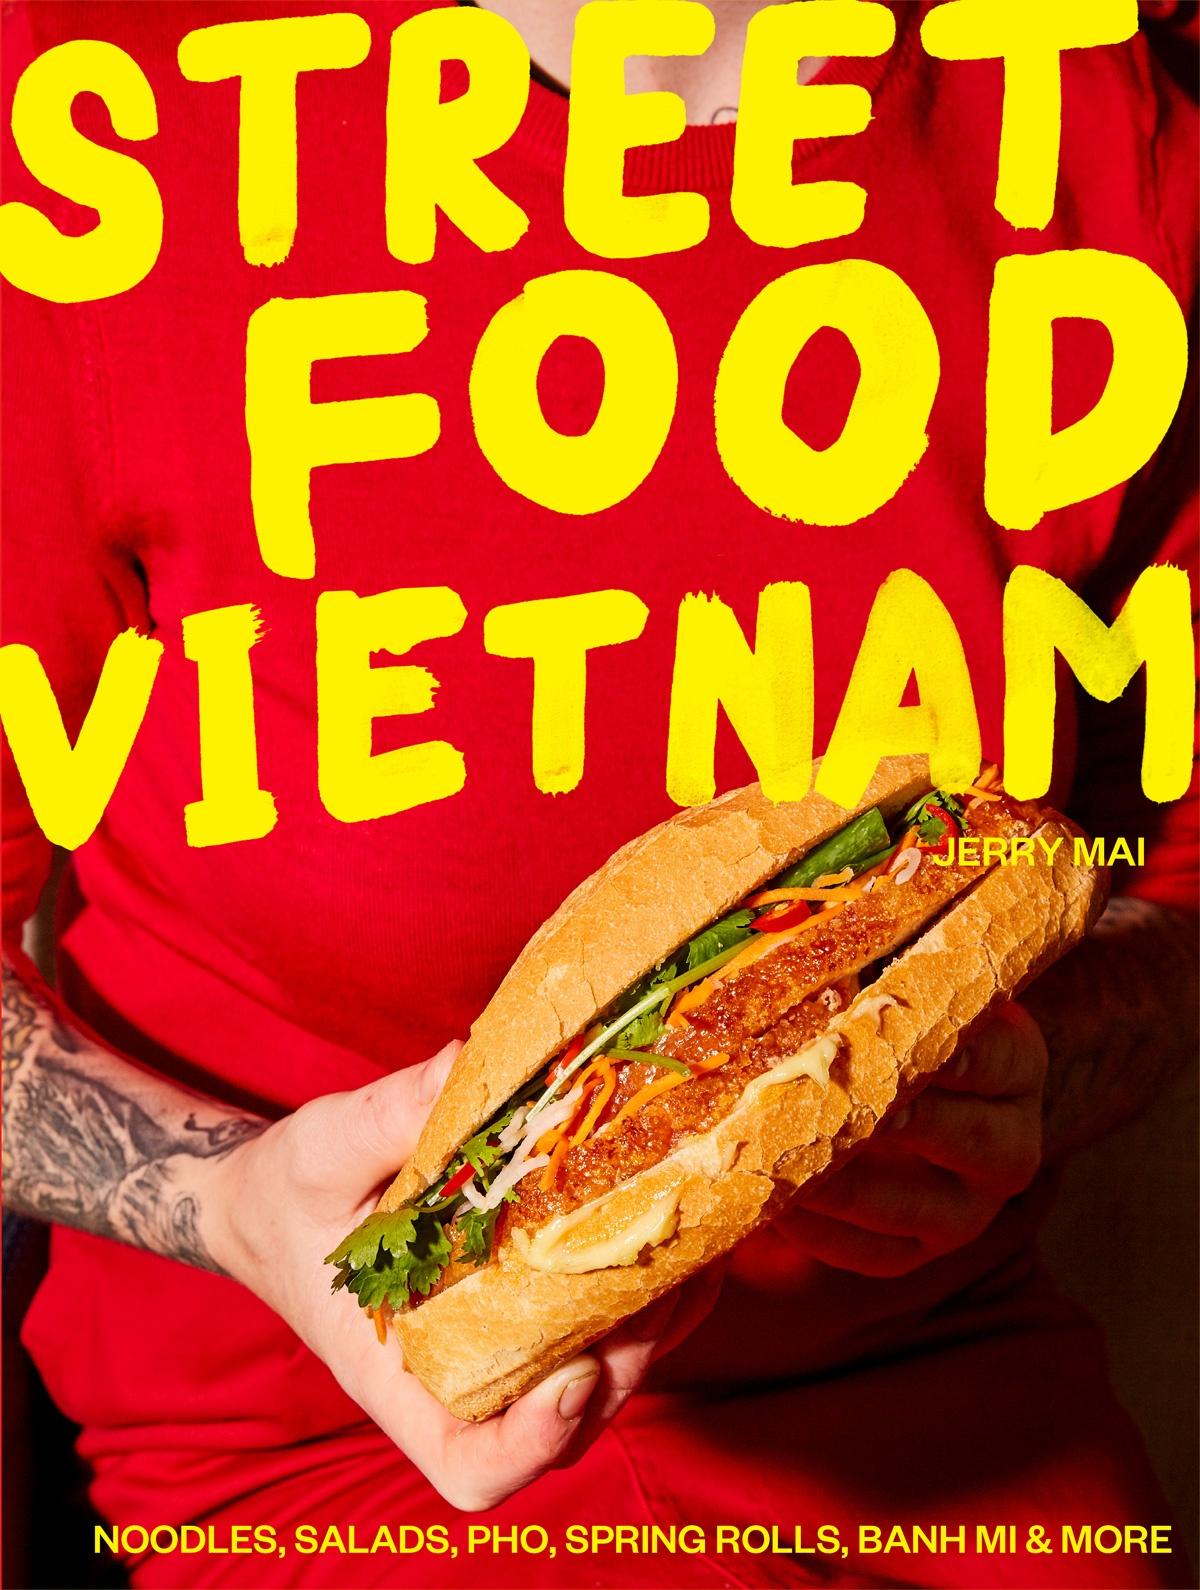 Street Food Vietnam by Jerry Mai | Cookbook Corner | Nigella